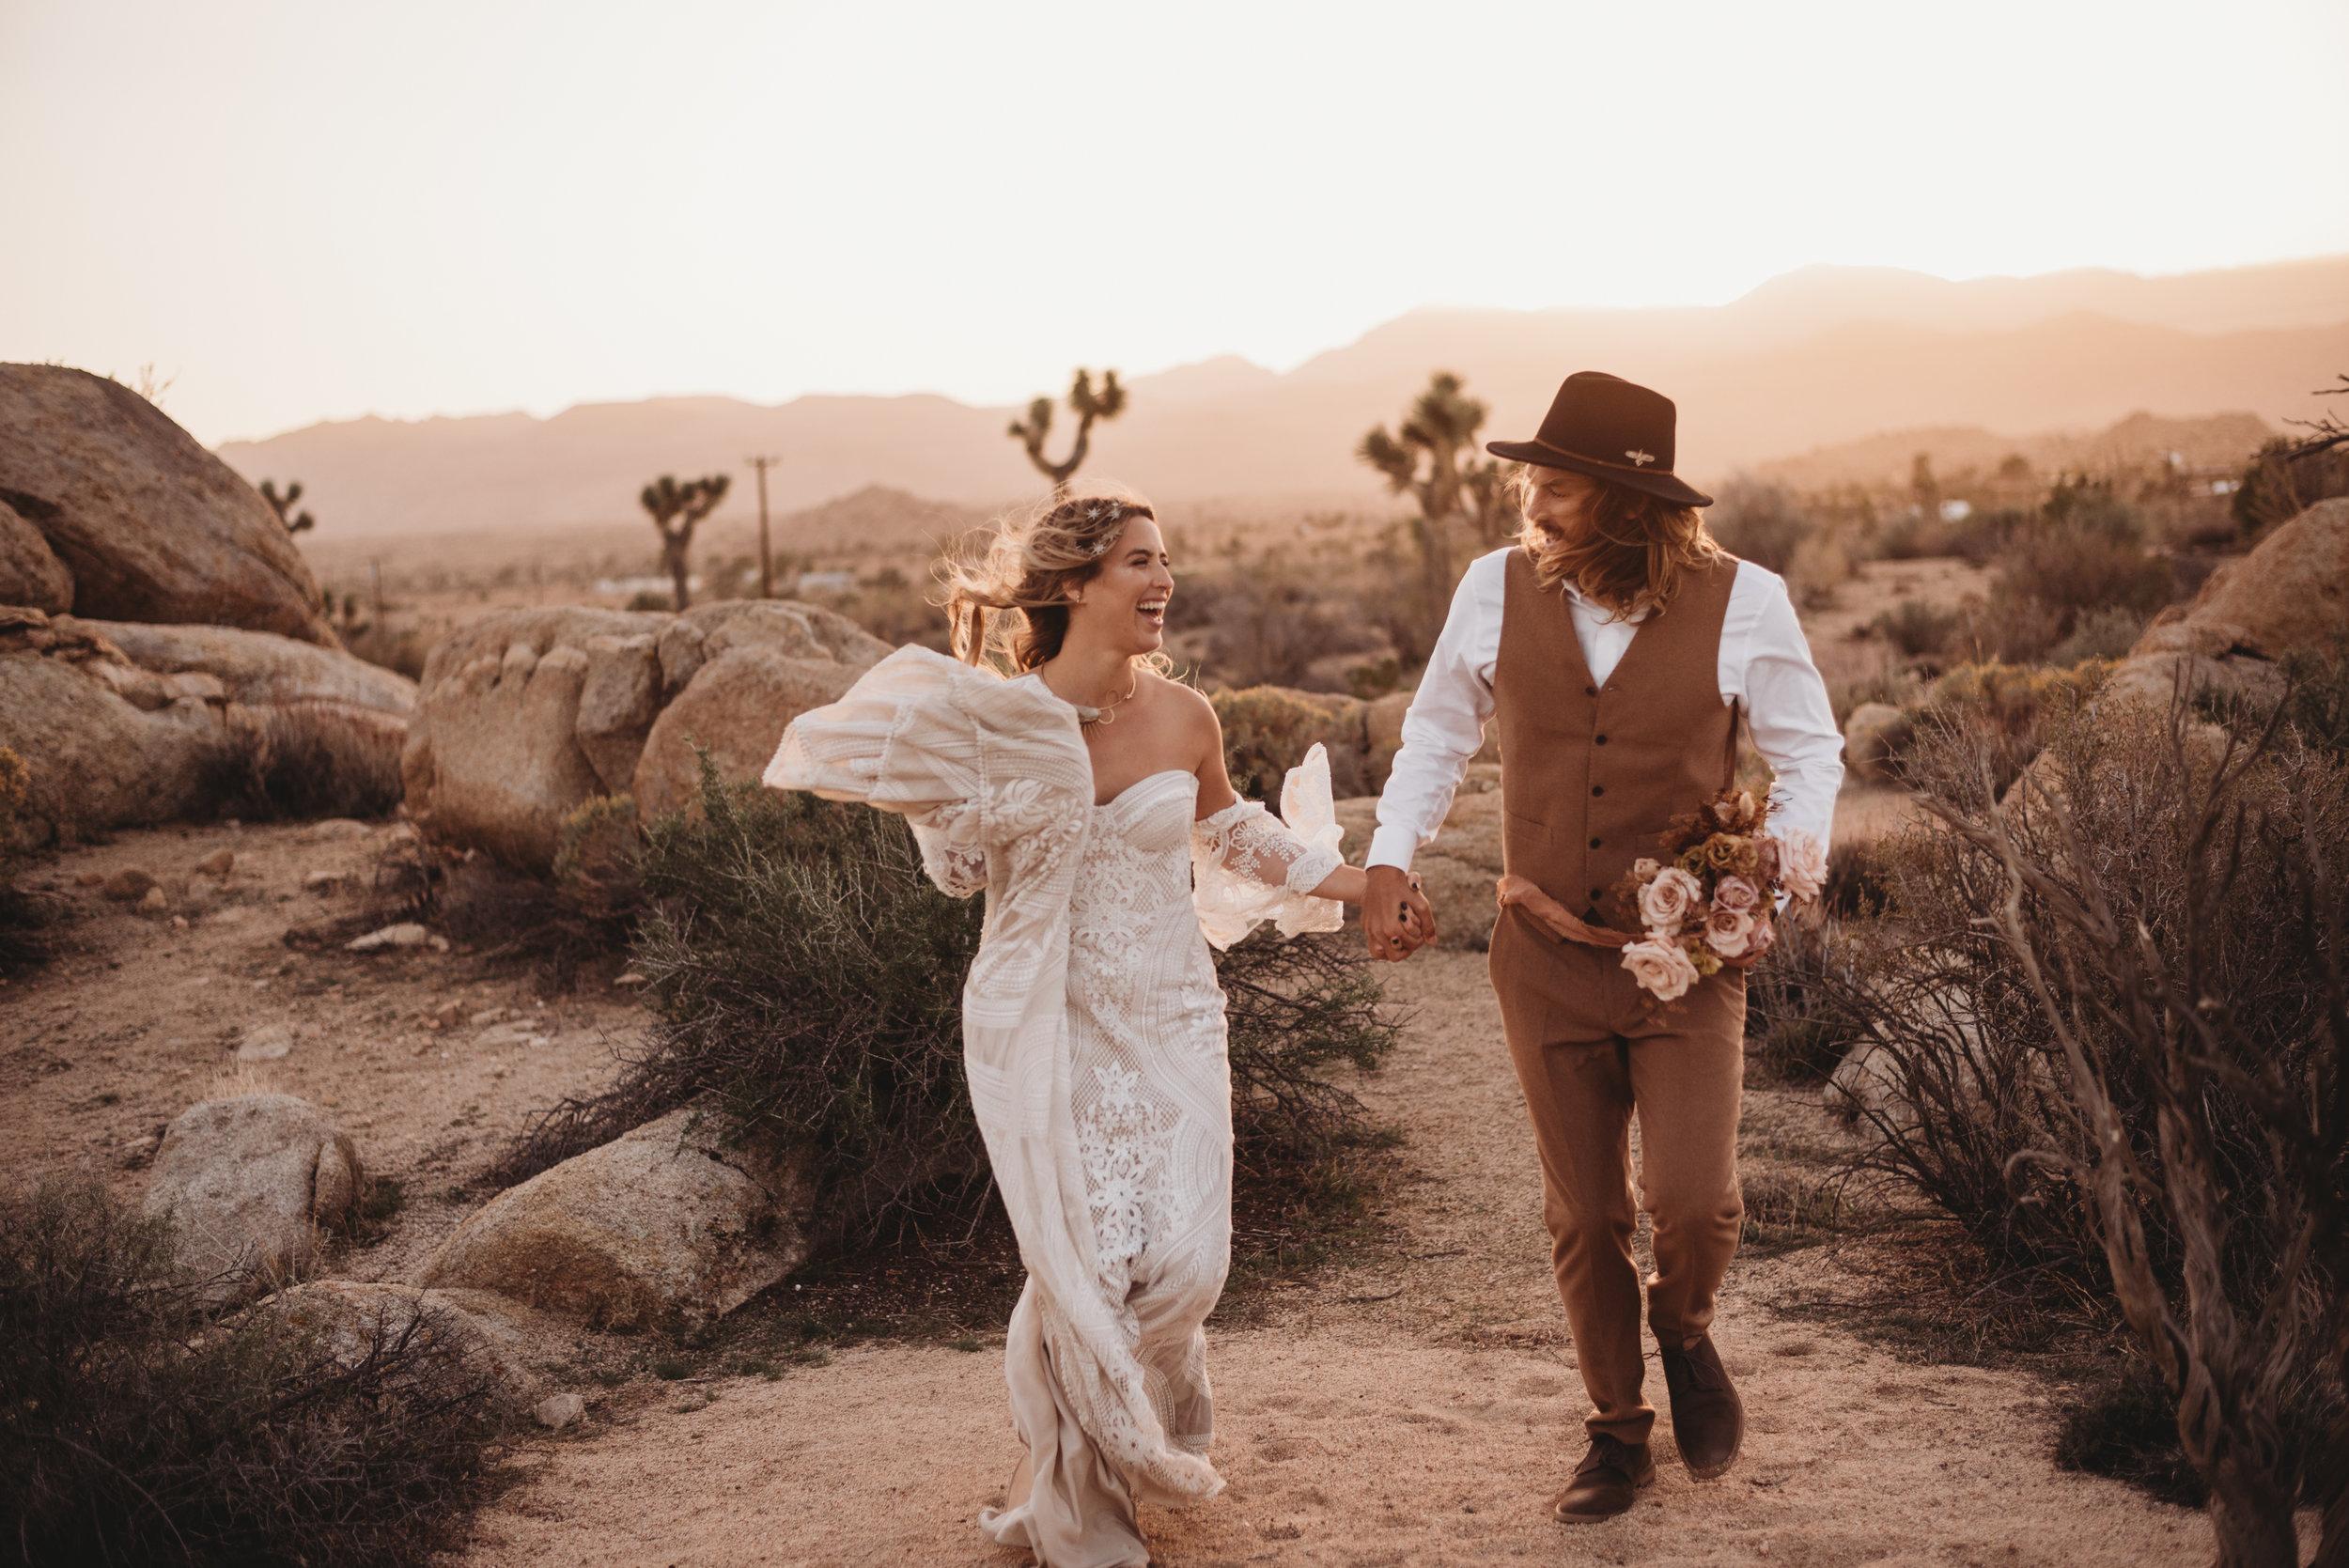 FortSt.John_photographer_TyraEPhotography_Wedding_Couple_Family_Photograhy_DawsonCreek_Elopement_Bride_Boduoir_Portraits-8476.jpg